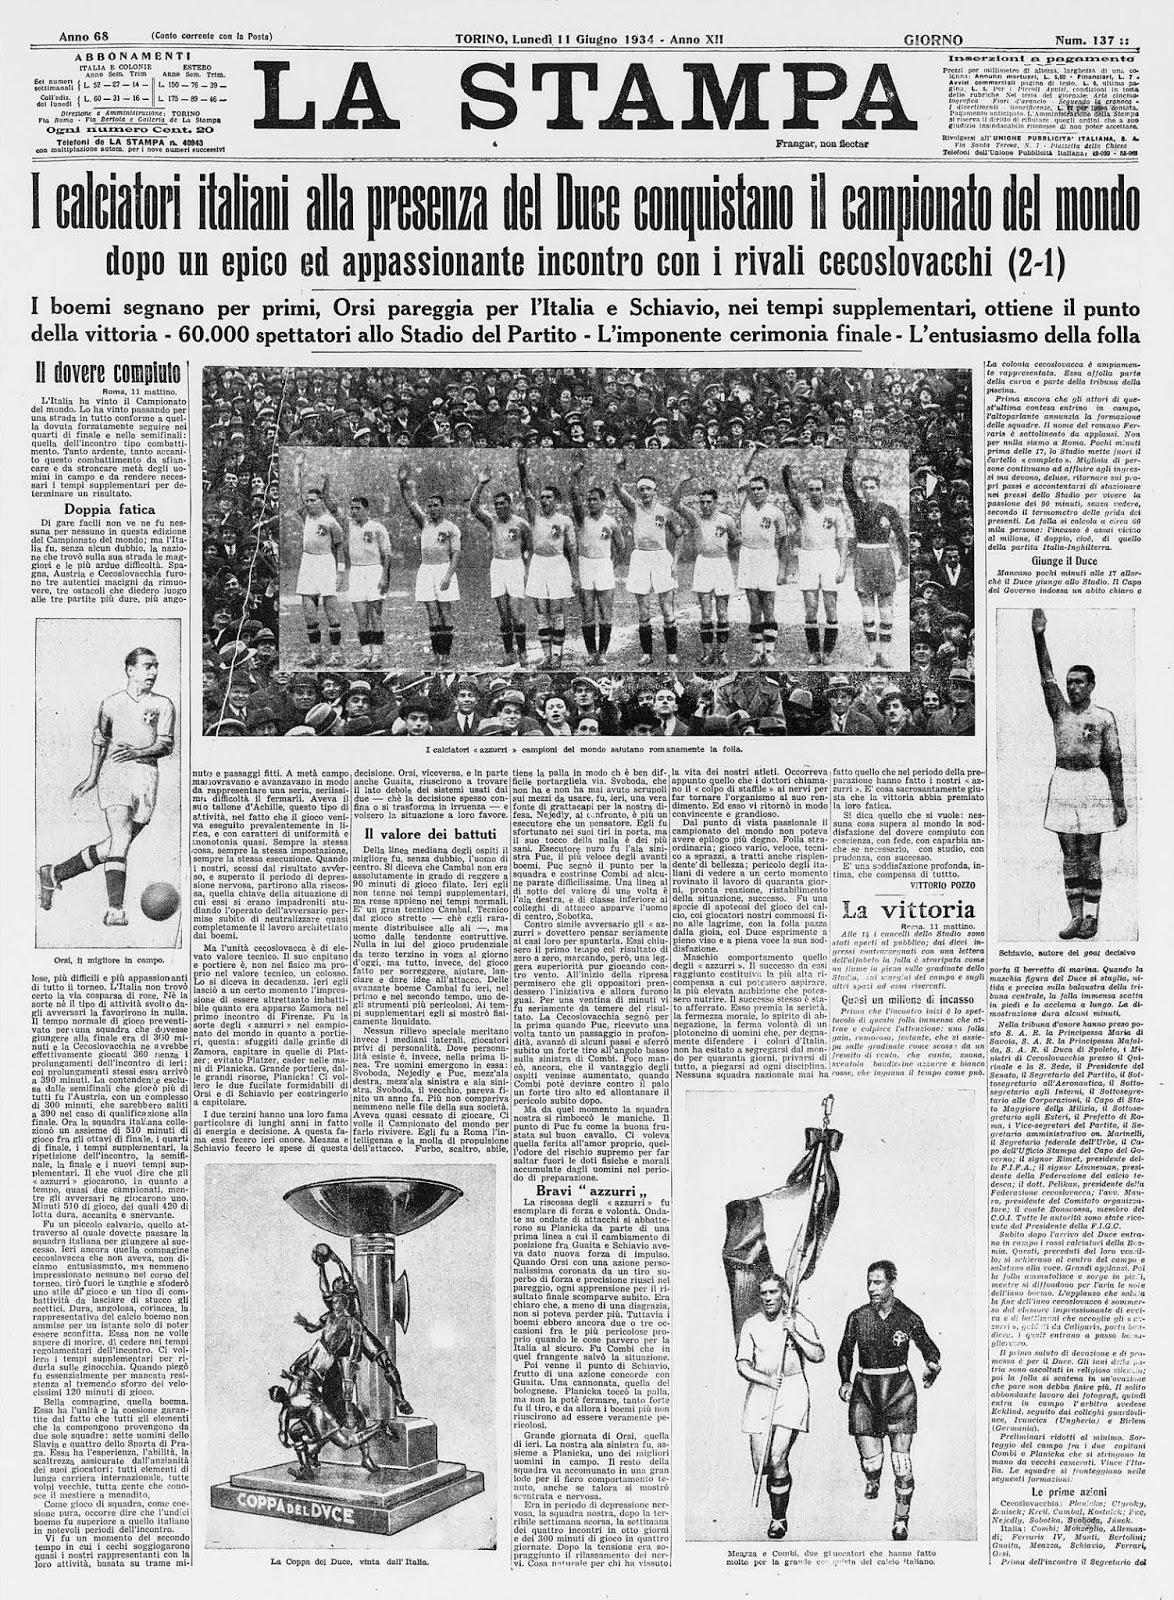 20 - La Stampa 11-06-1934